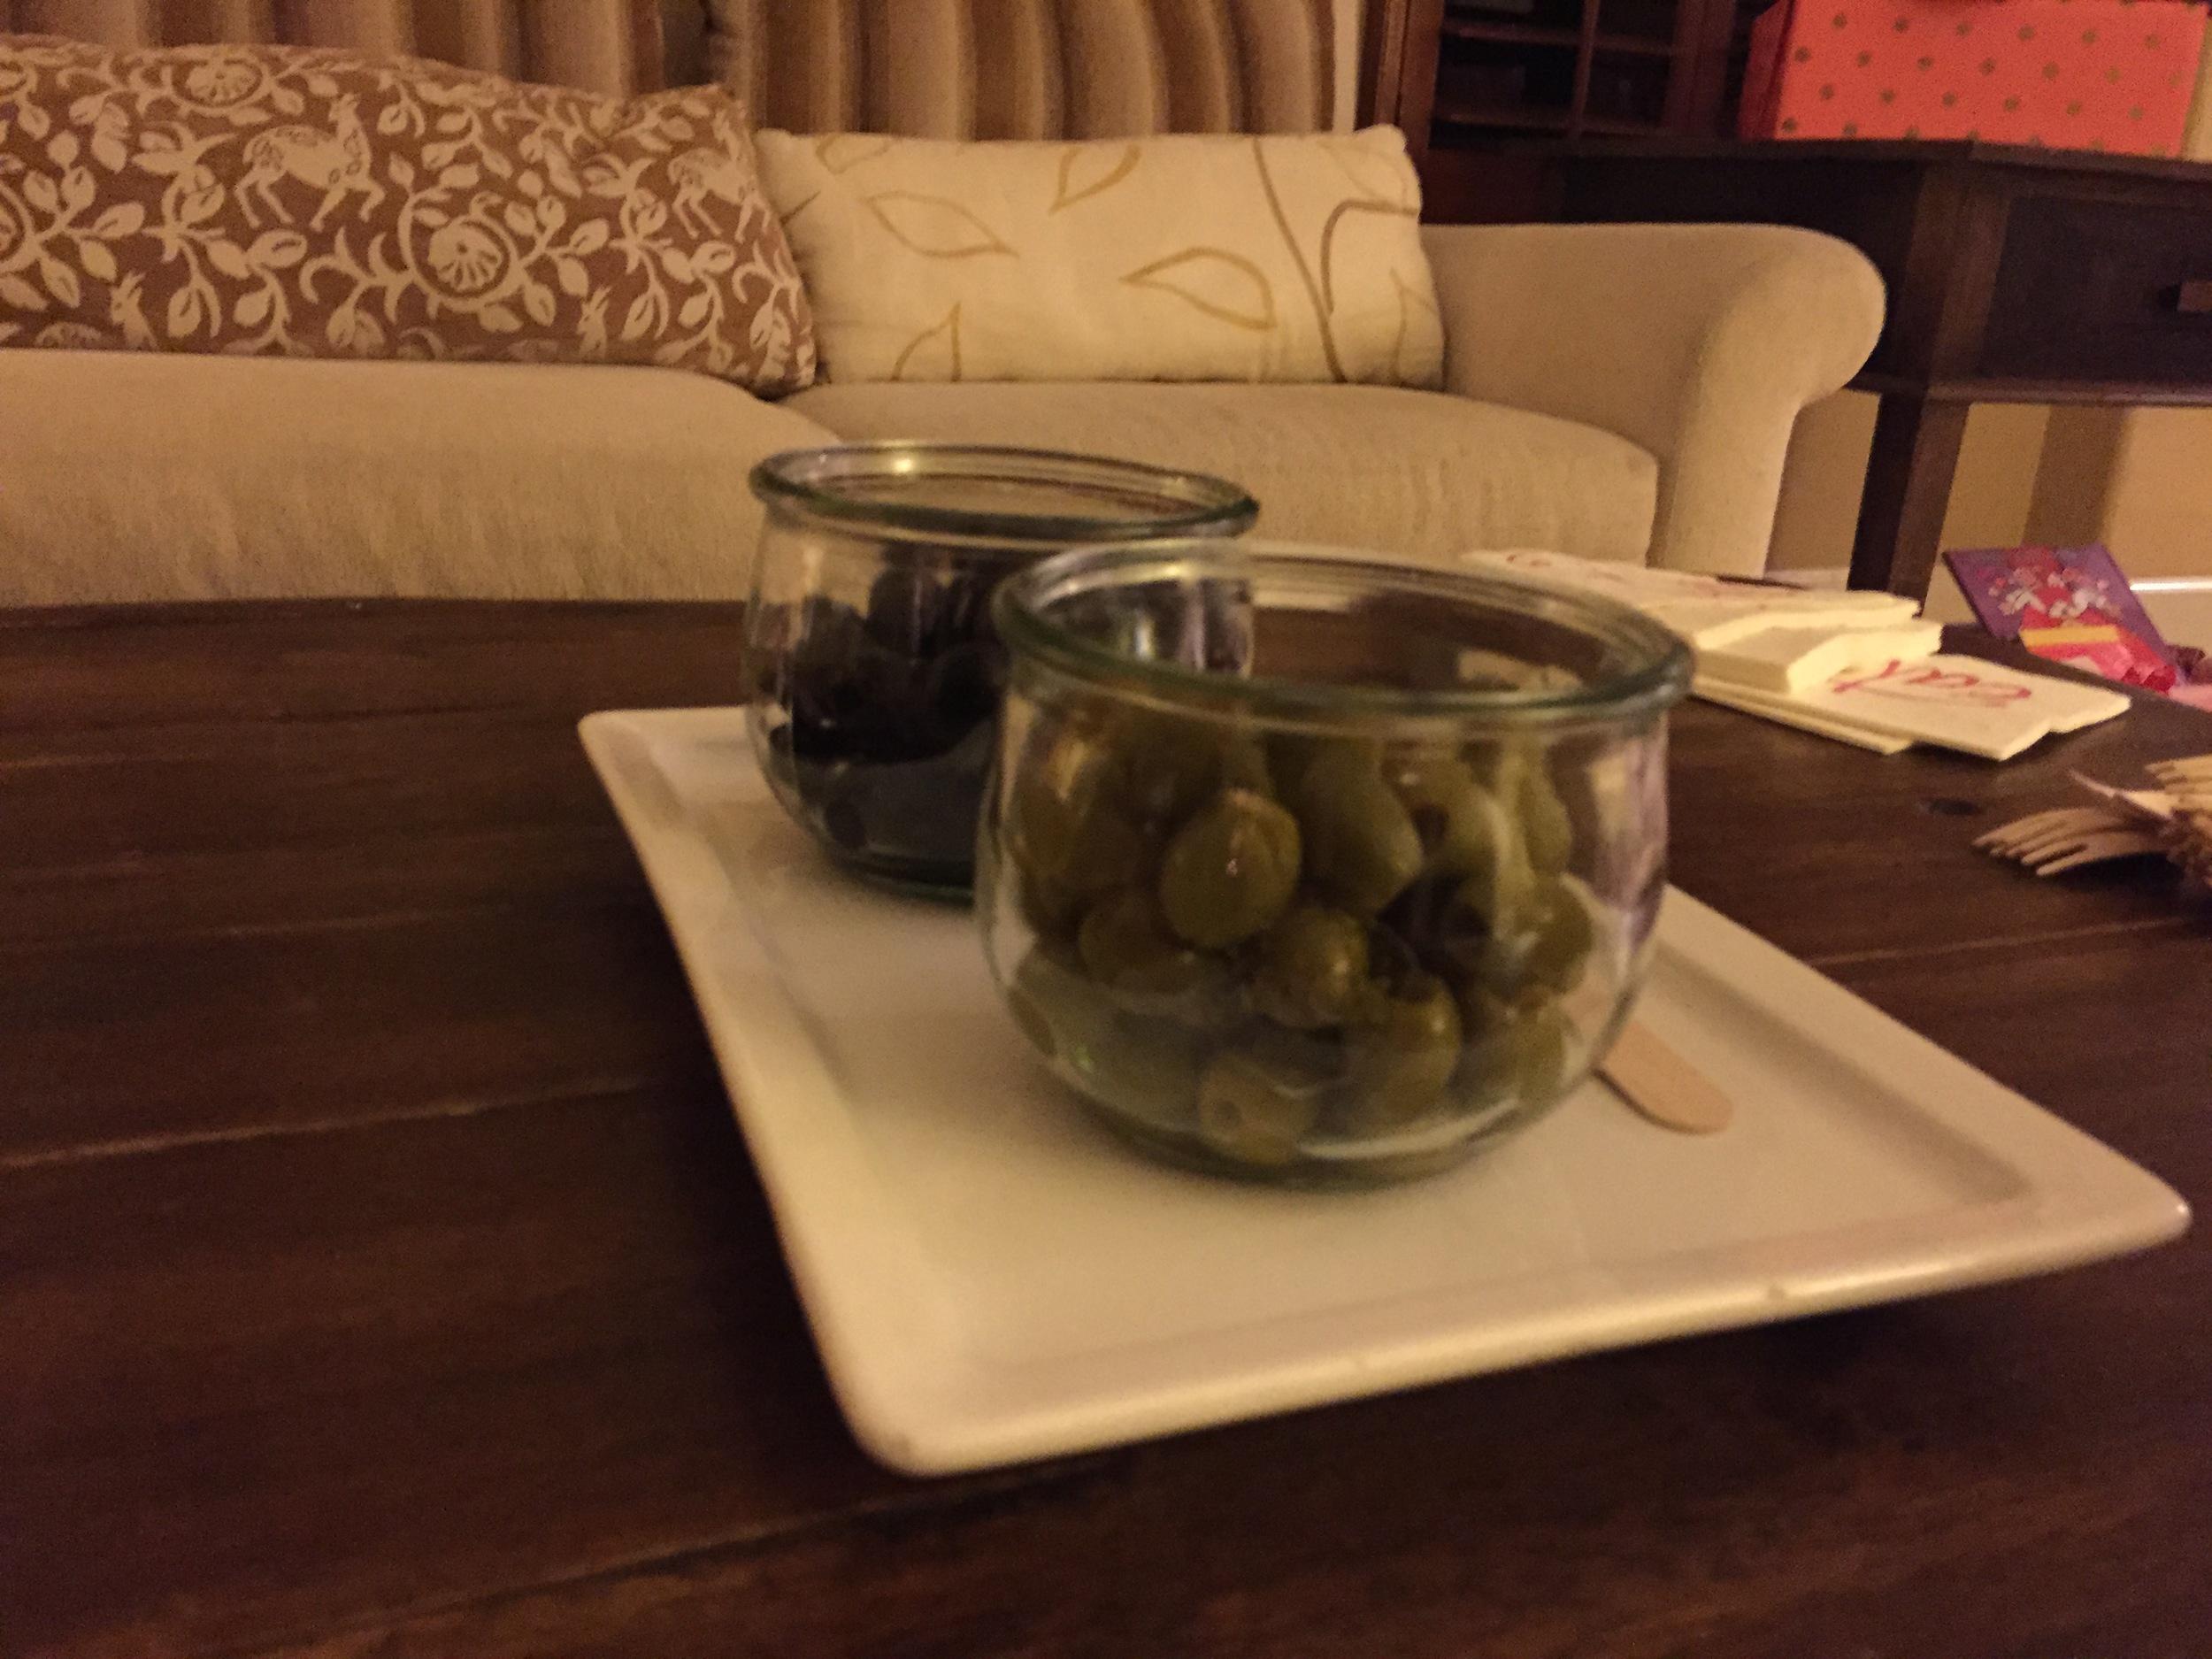 Weck Jars and Italian Olives